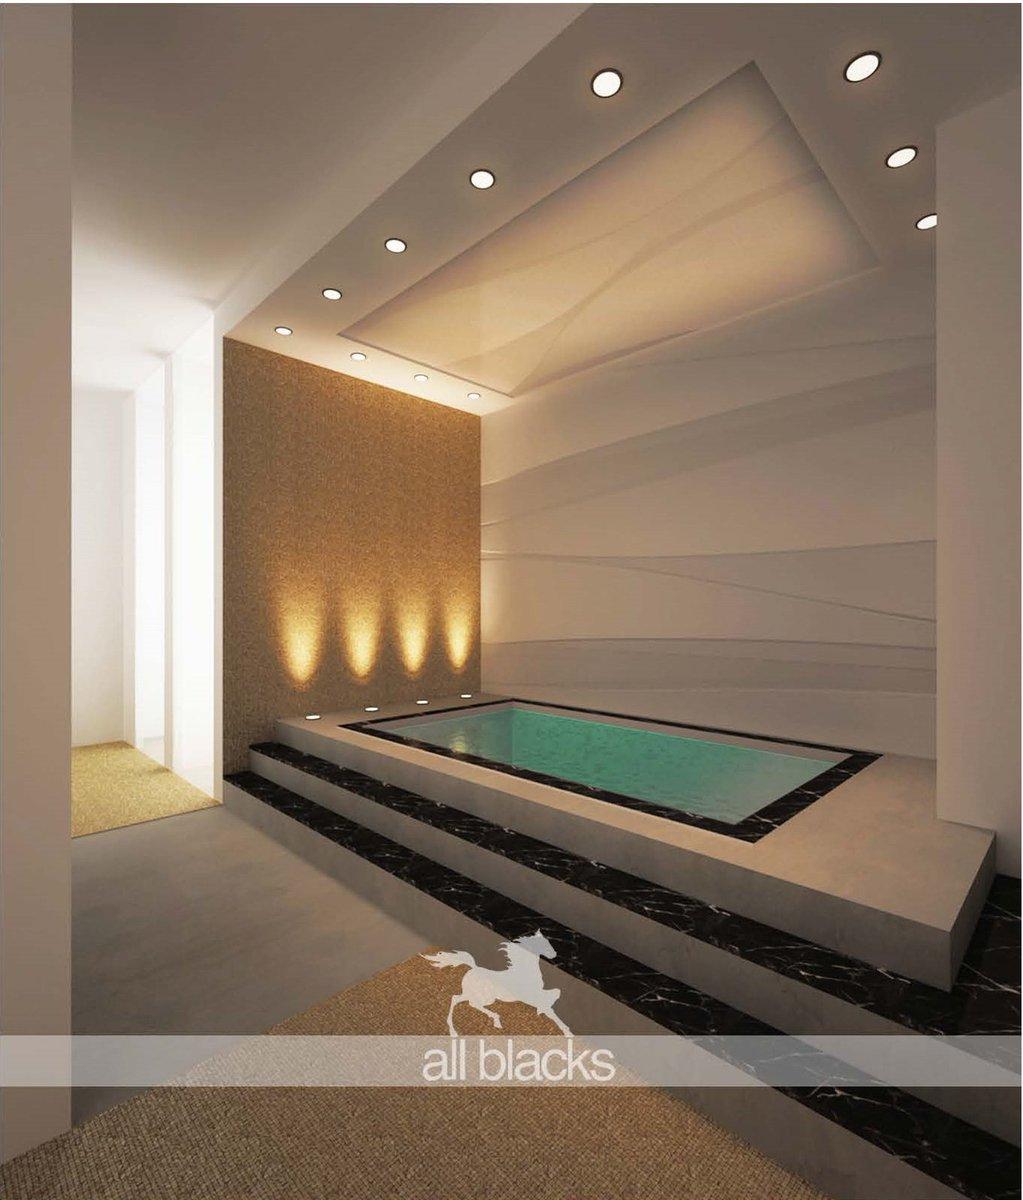 #bathroom #place #spa #water #room #interiordesign #colors #cozy #uae  #middleeast #singapore #NYC #canpic.twitter.com/ueV4iMRDvX